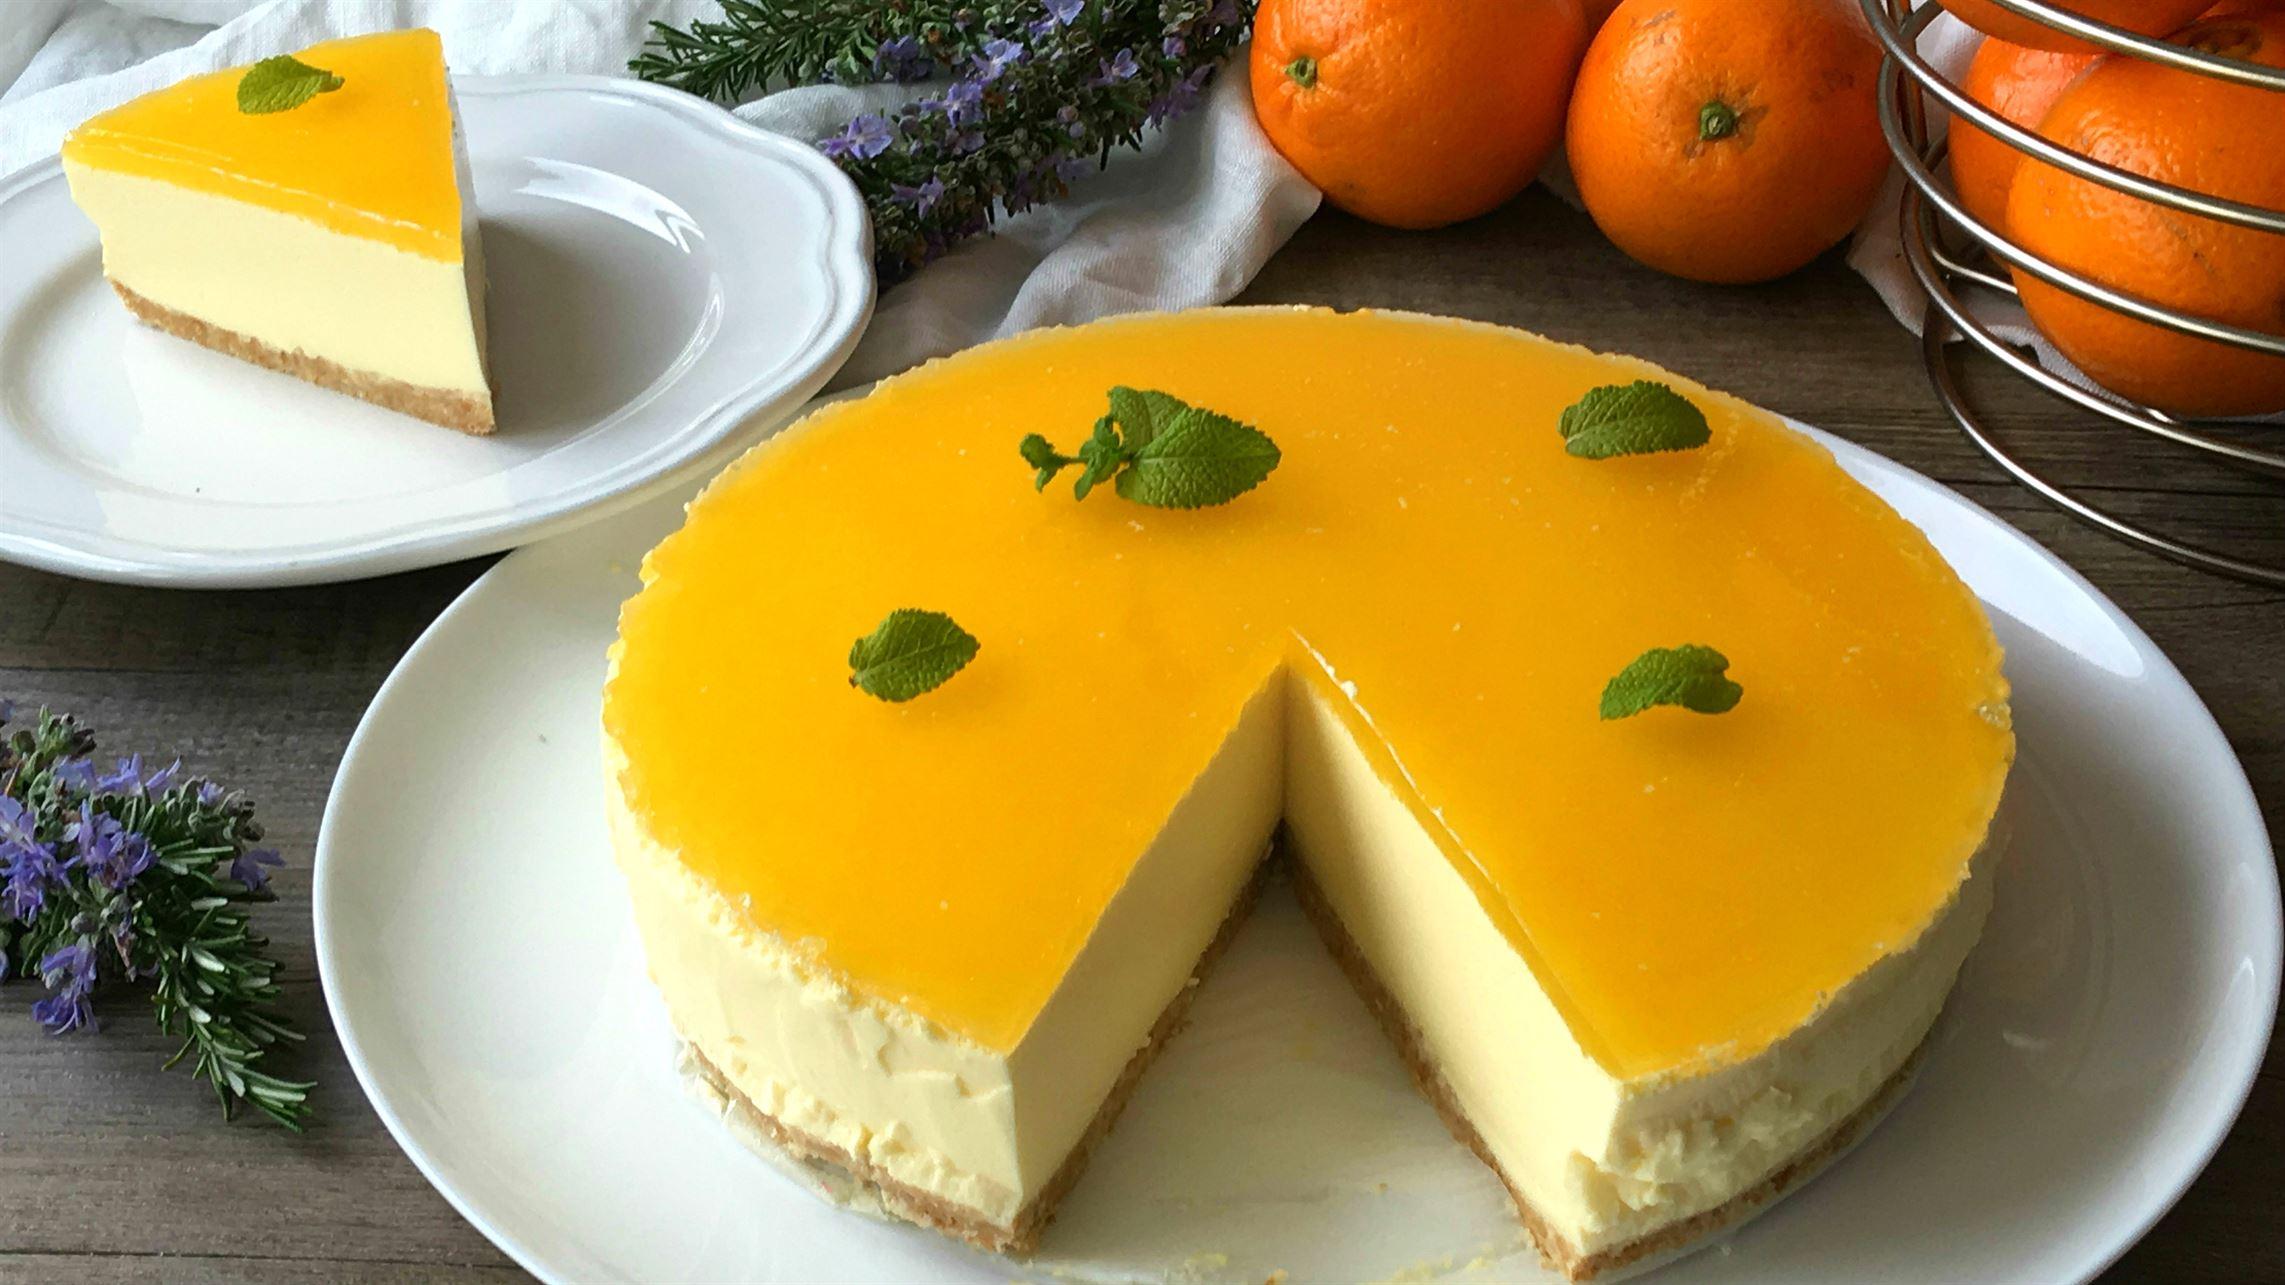 Tarta de naranja sin horno (cheesecake de naranja)